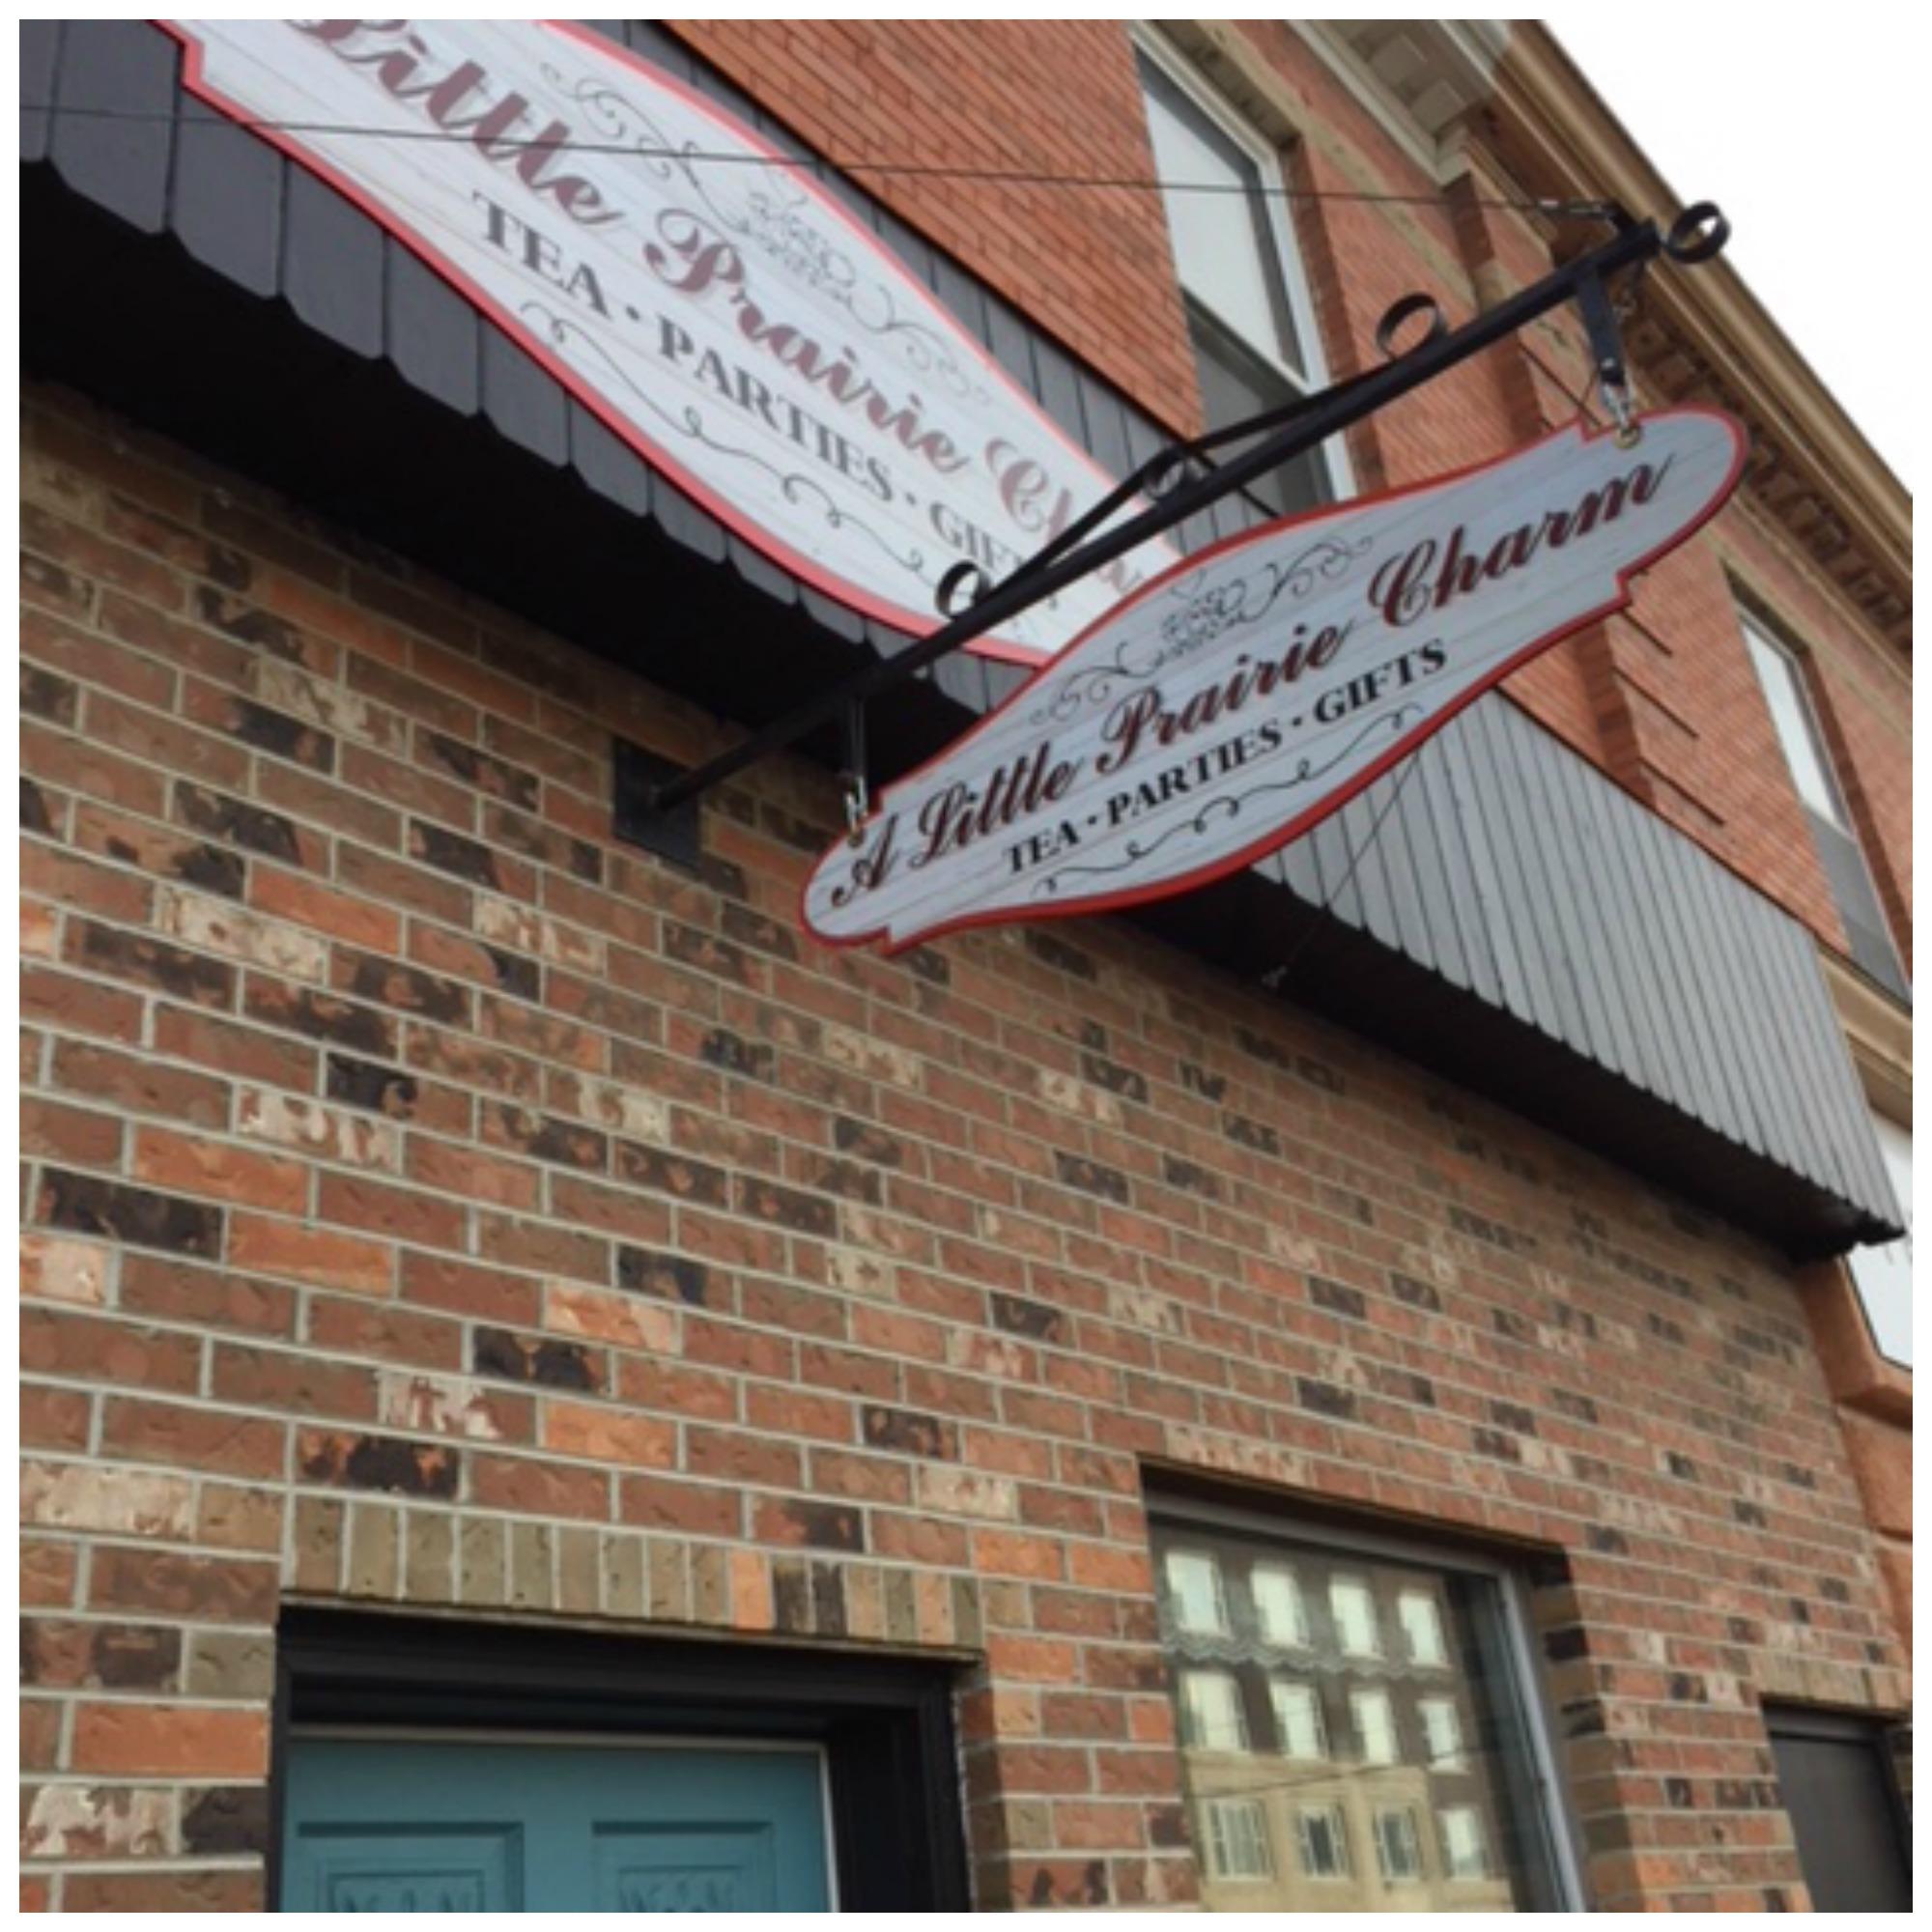 A Little Prairie Charm is located at 35 High St. E.